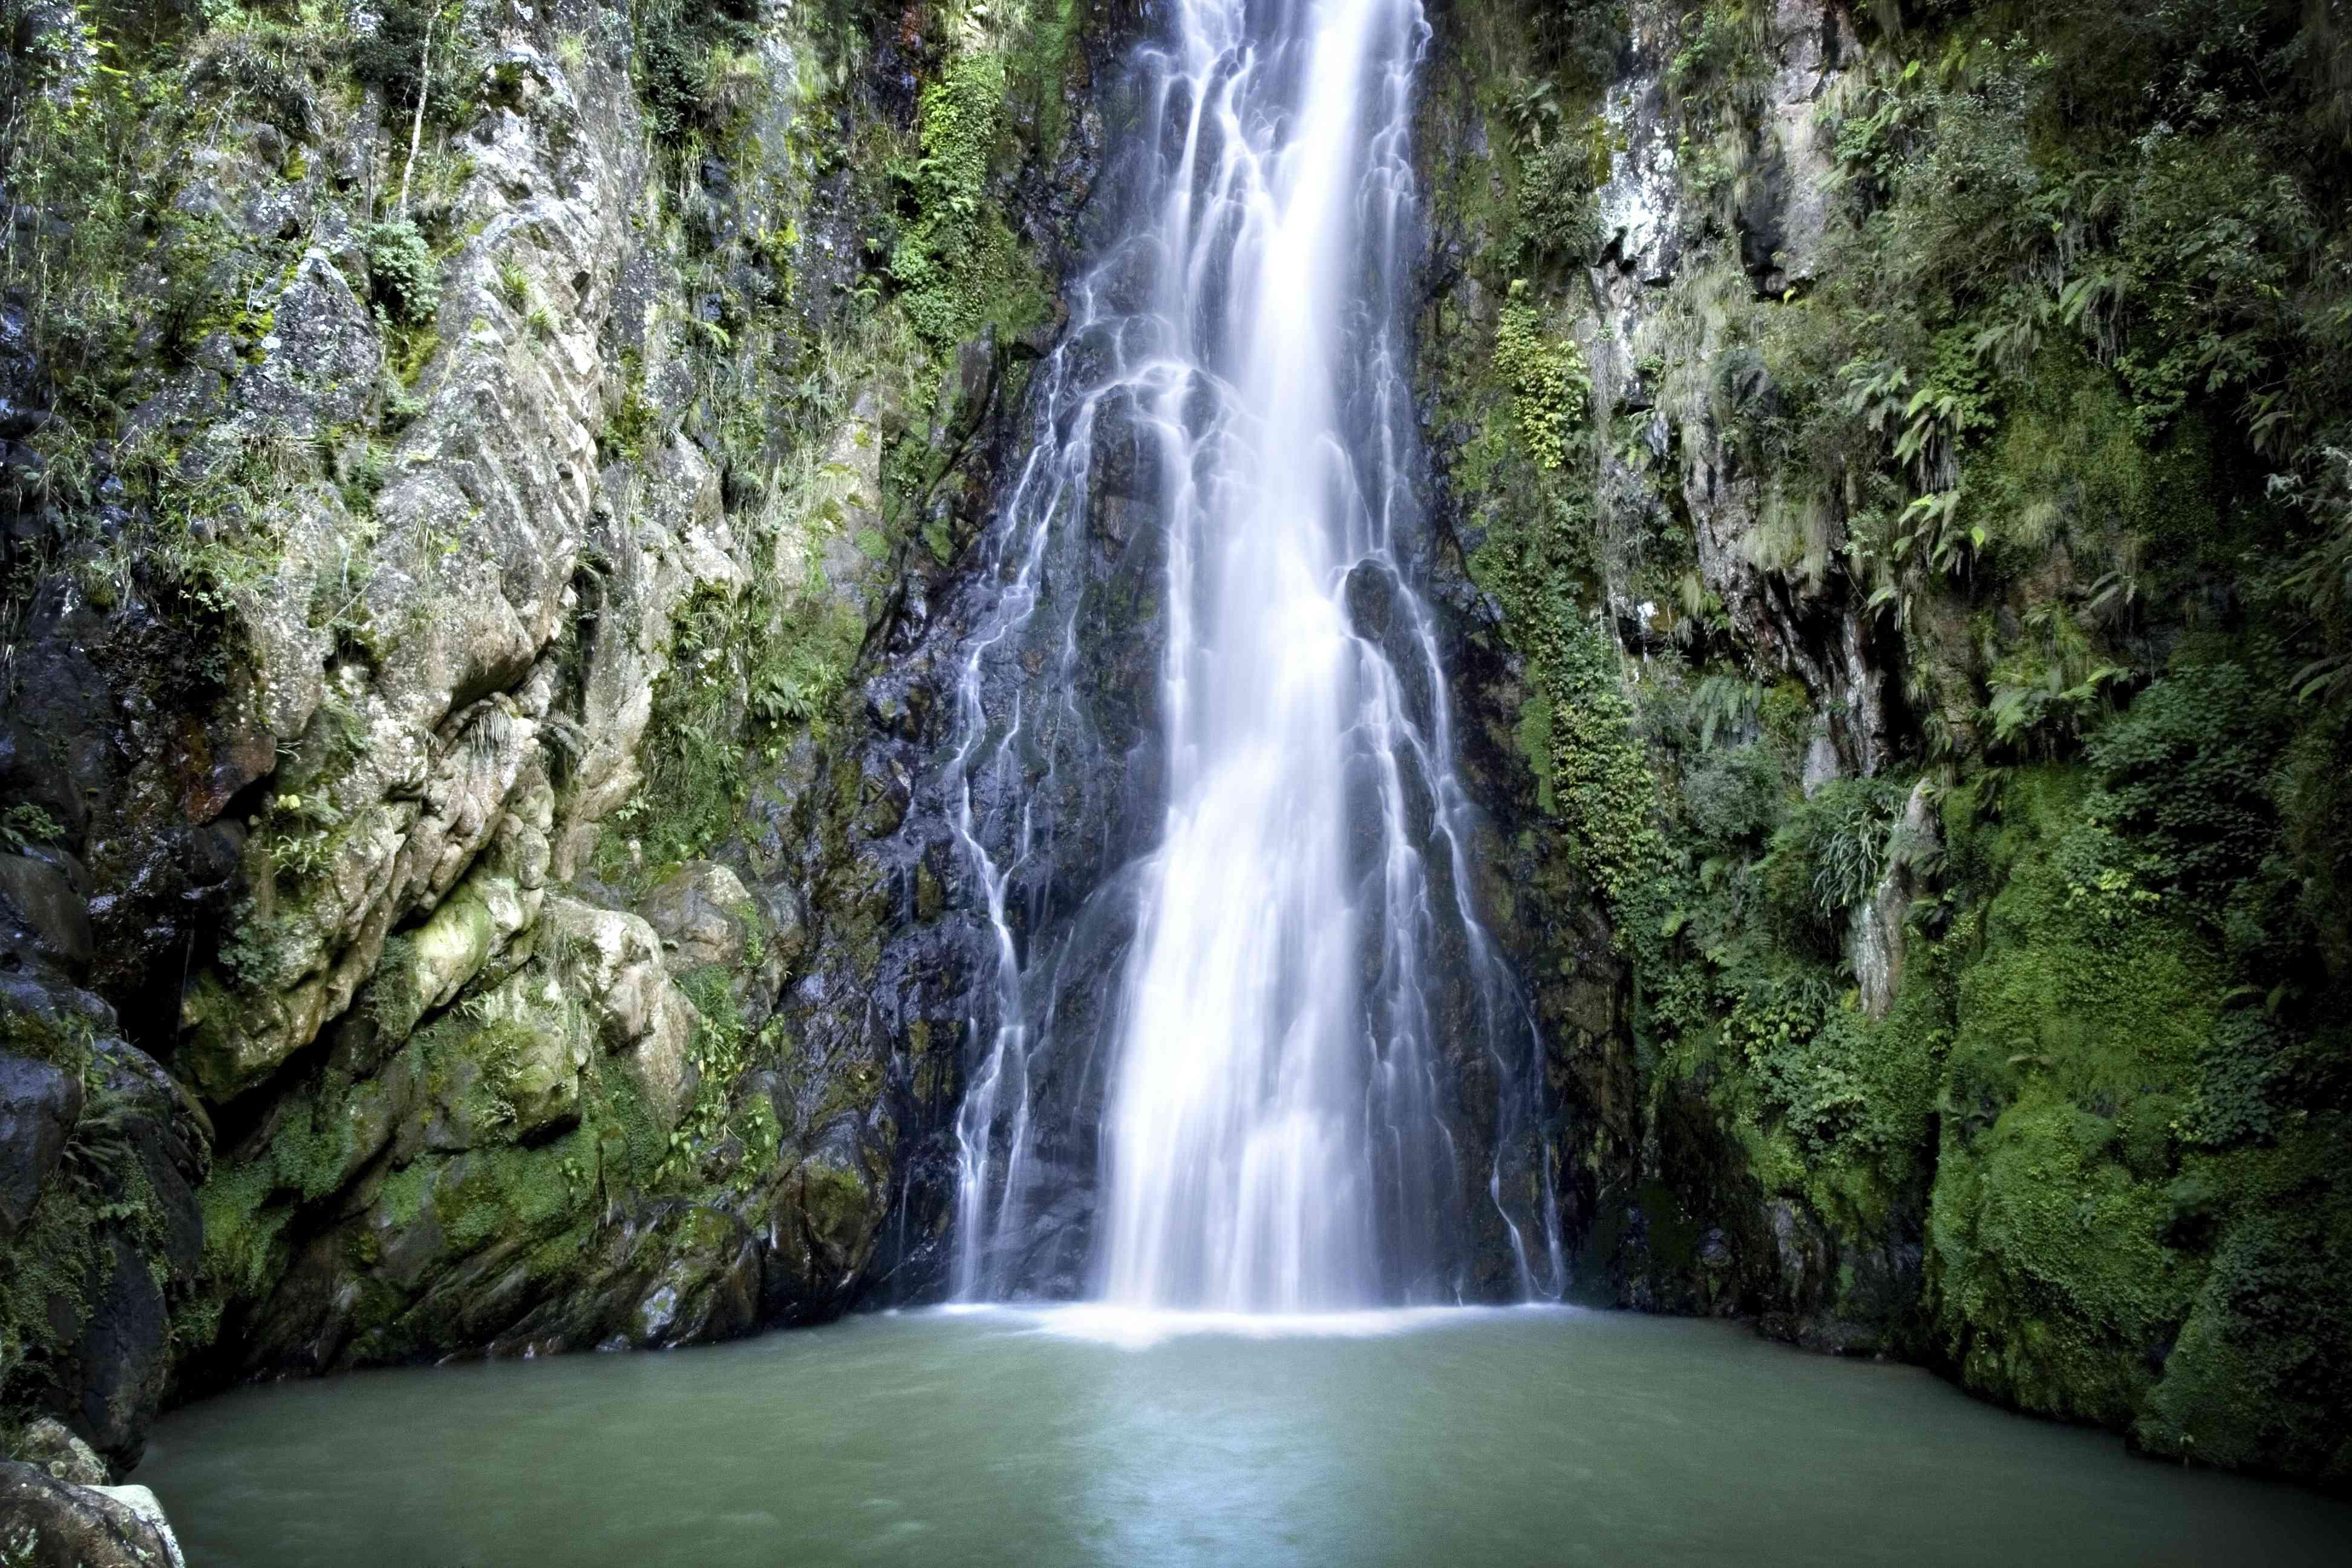 Salto de Aguas Blancas / Aguas Blancas waterfall